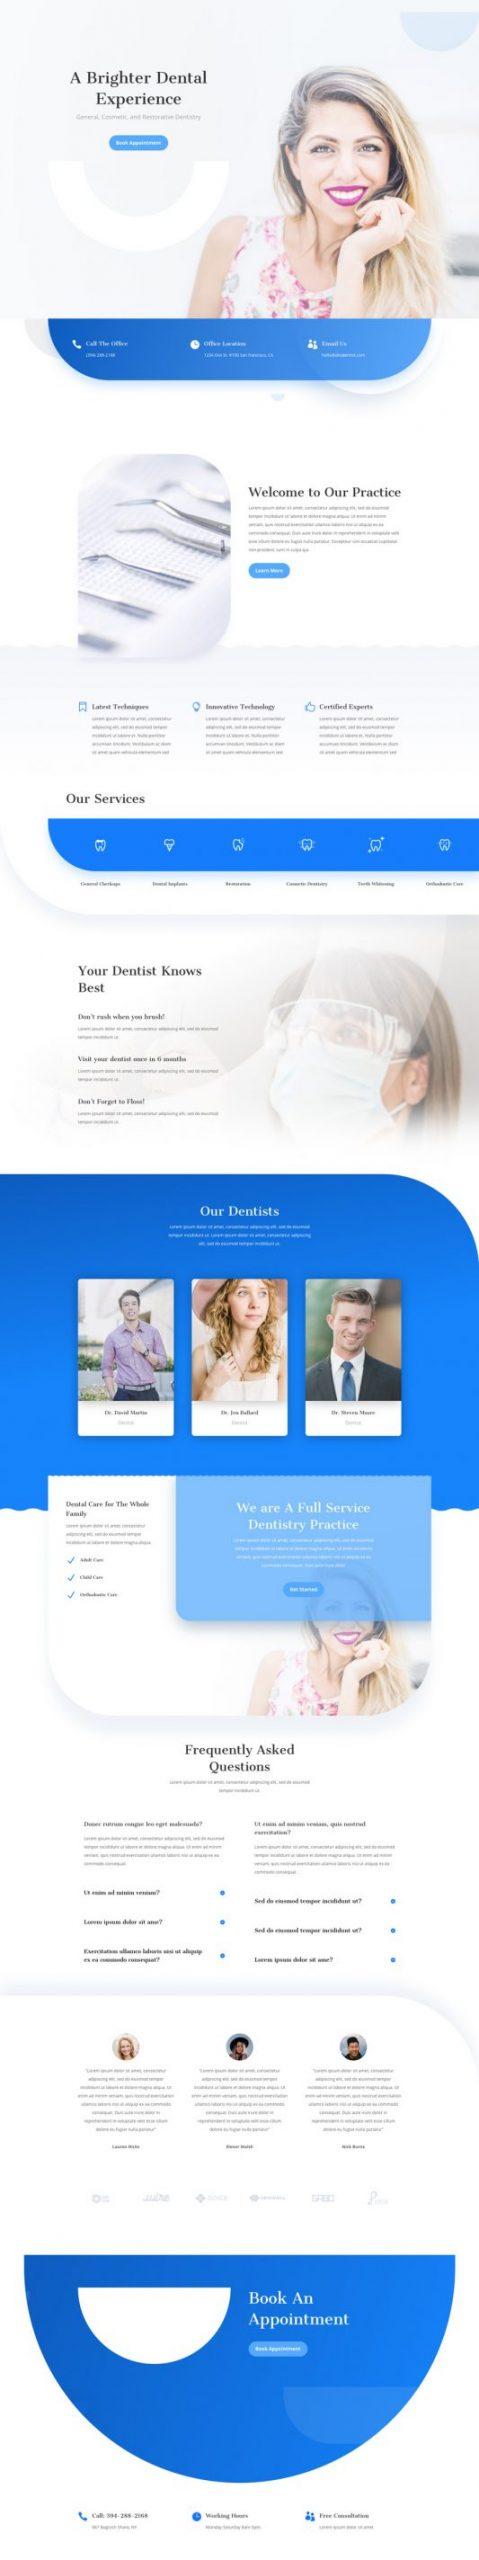 Elegant Themes - Divi - dentist-landing-page-533x2847